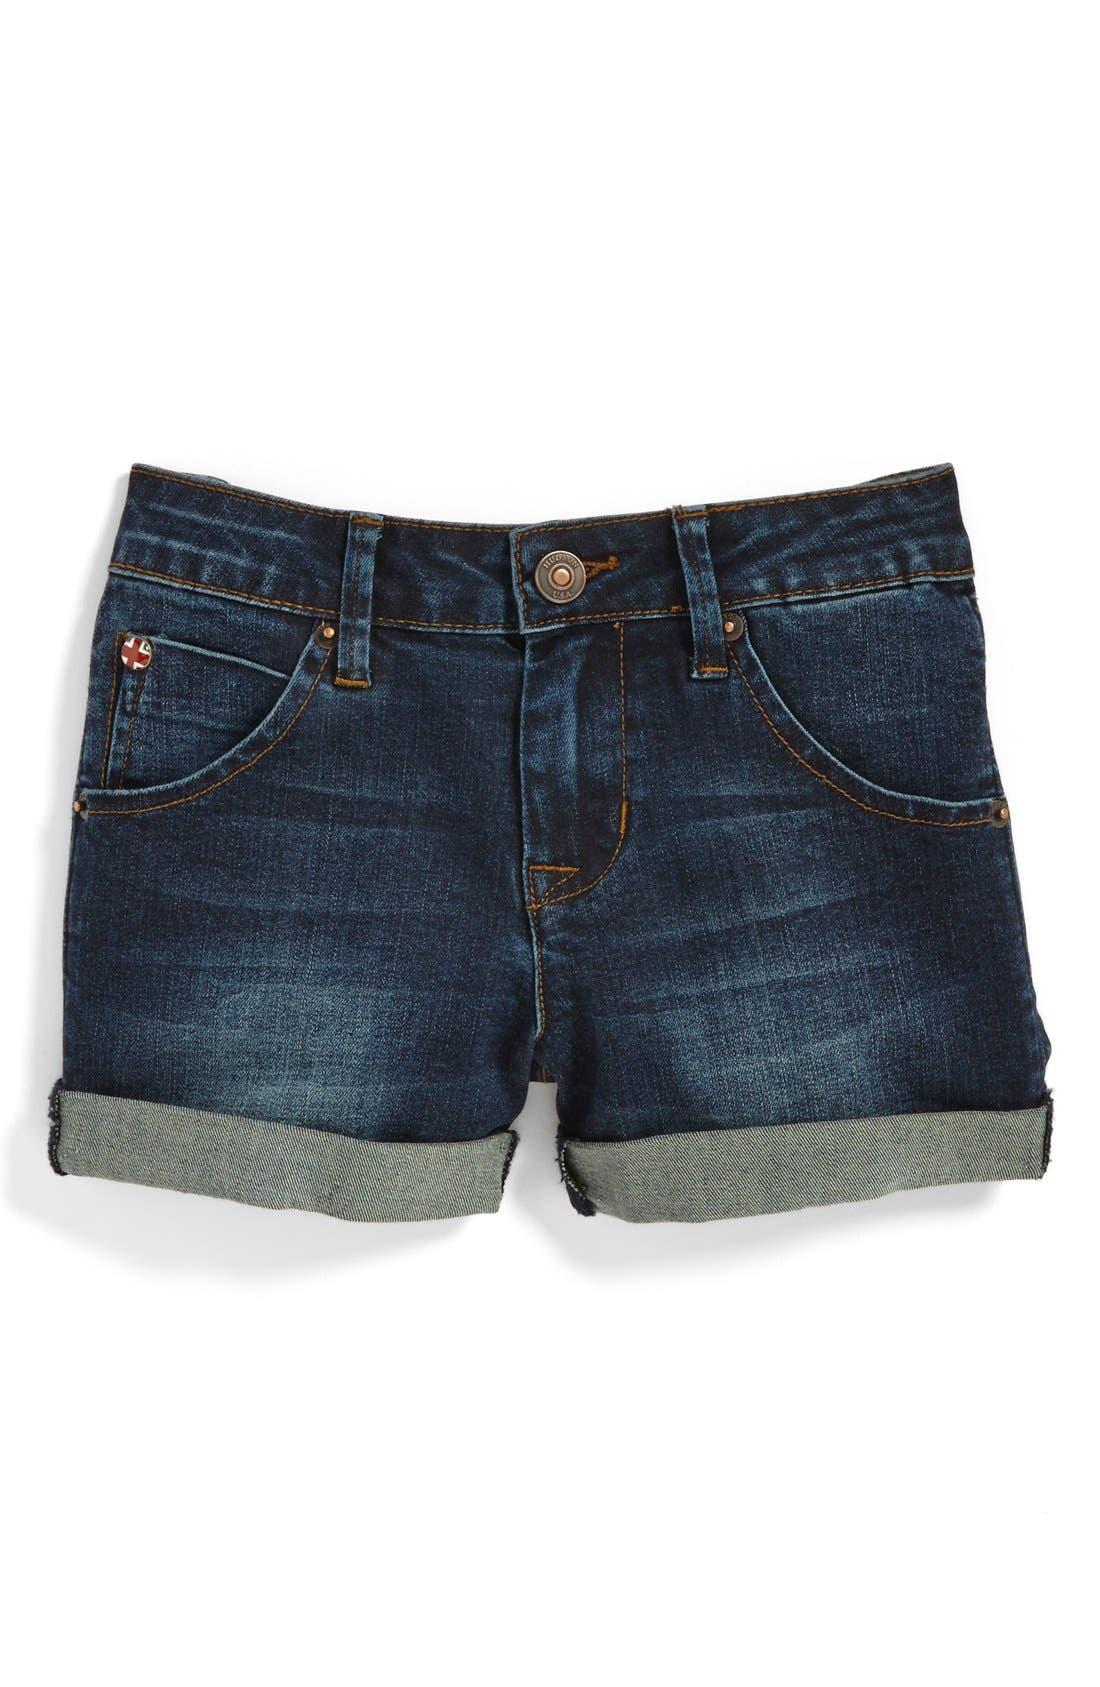 Alternate Image 1 Selected - Hudson Kids Roll Cuff Shorts (Toddler Girls, Little Girls & Big Girls)